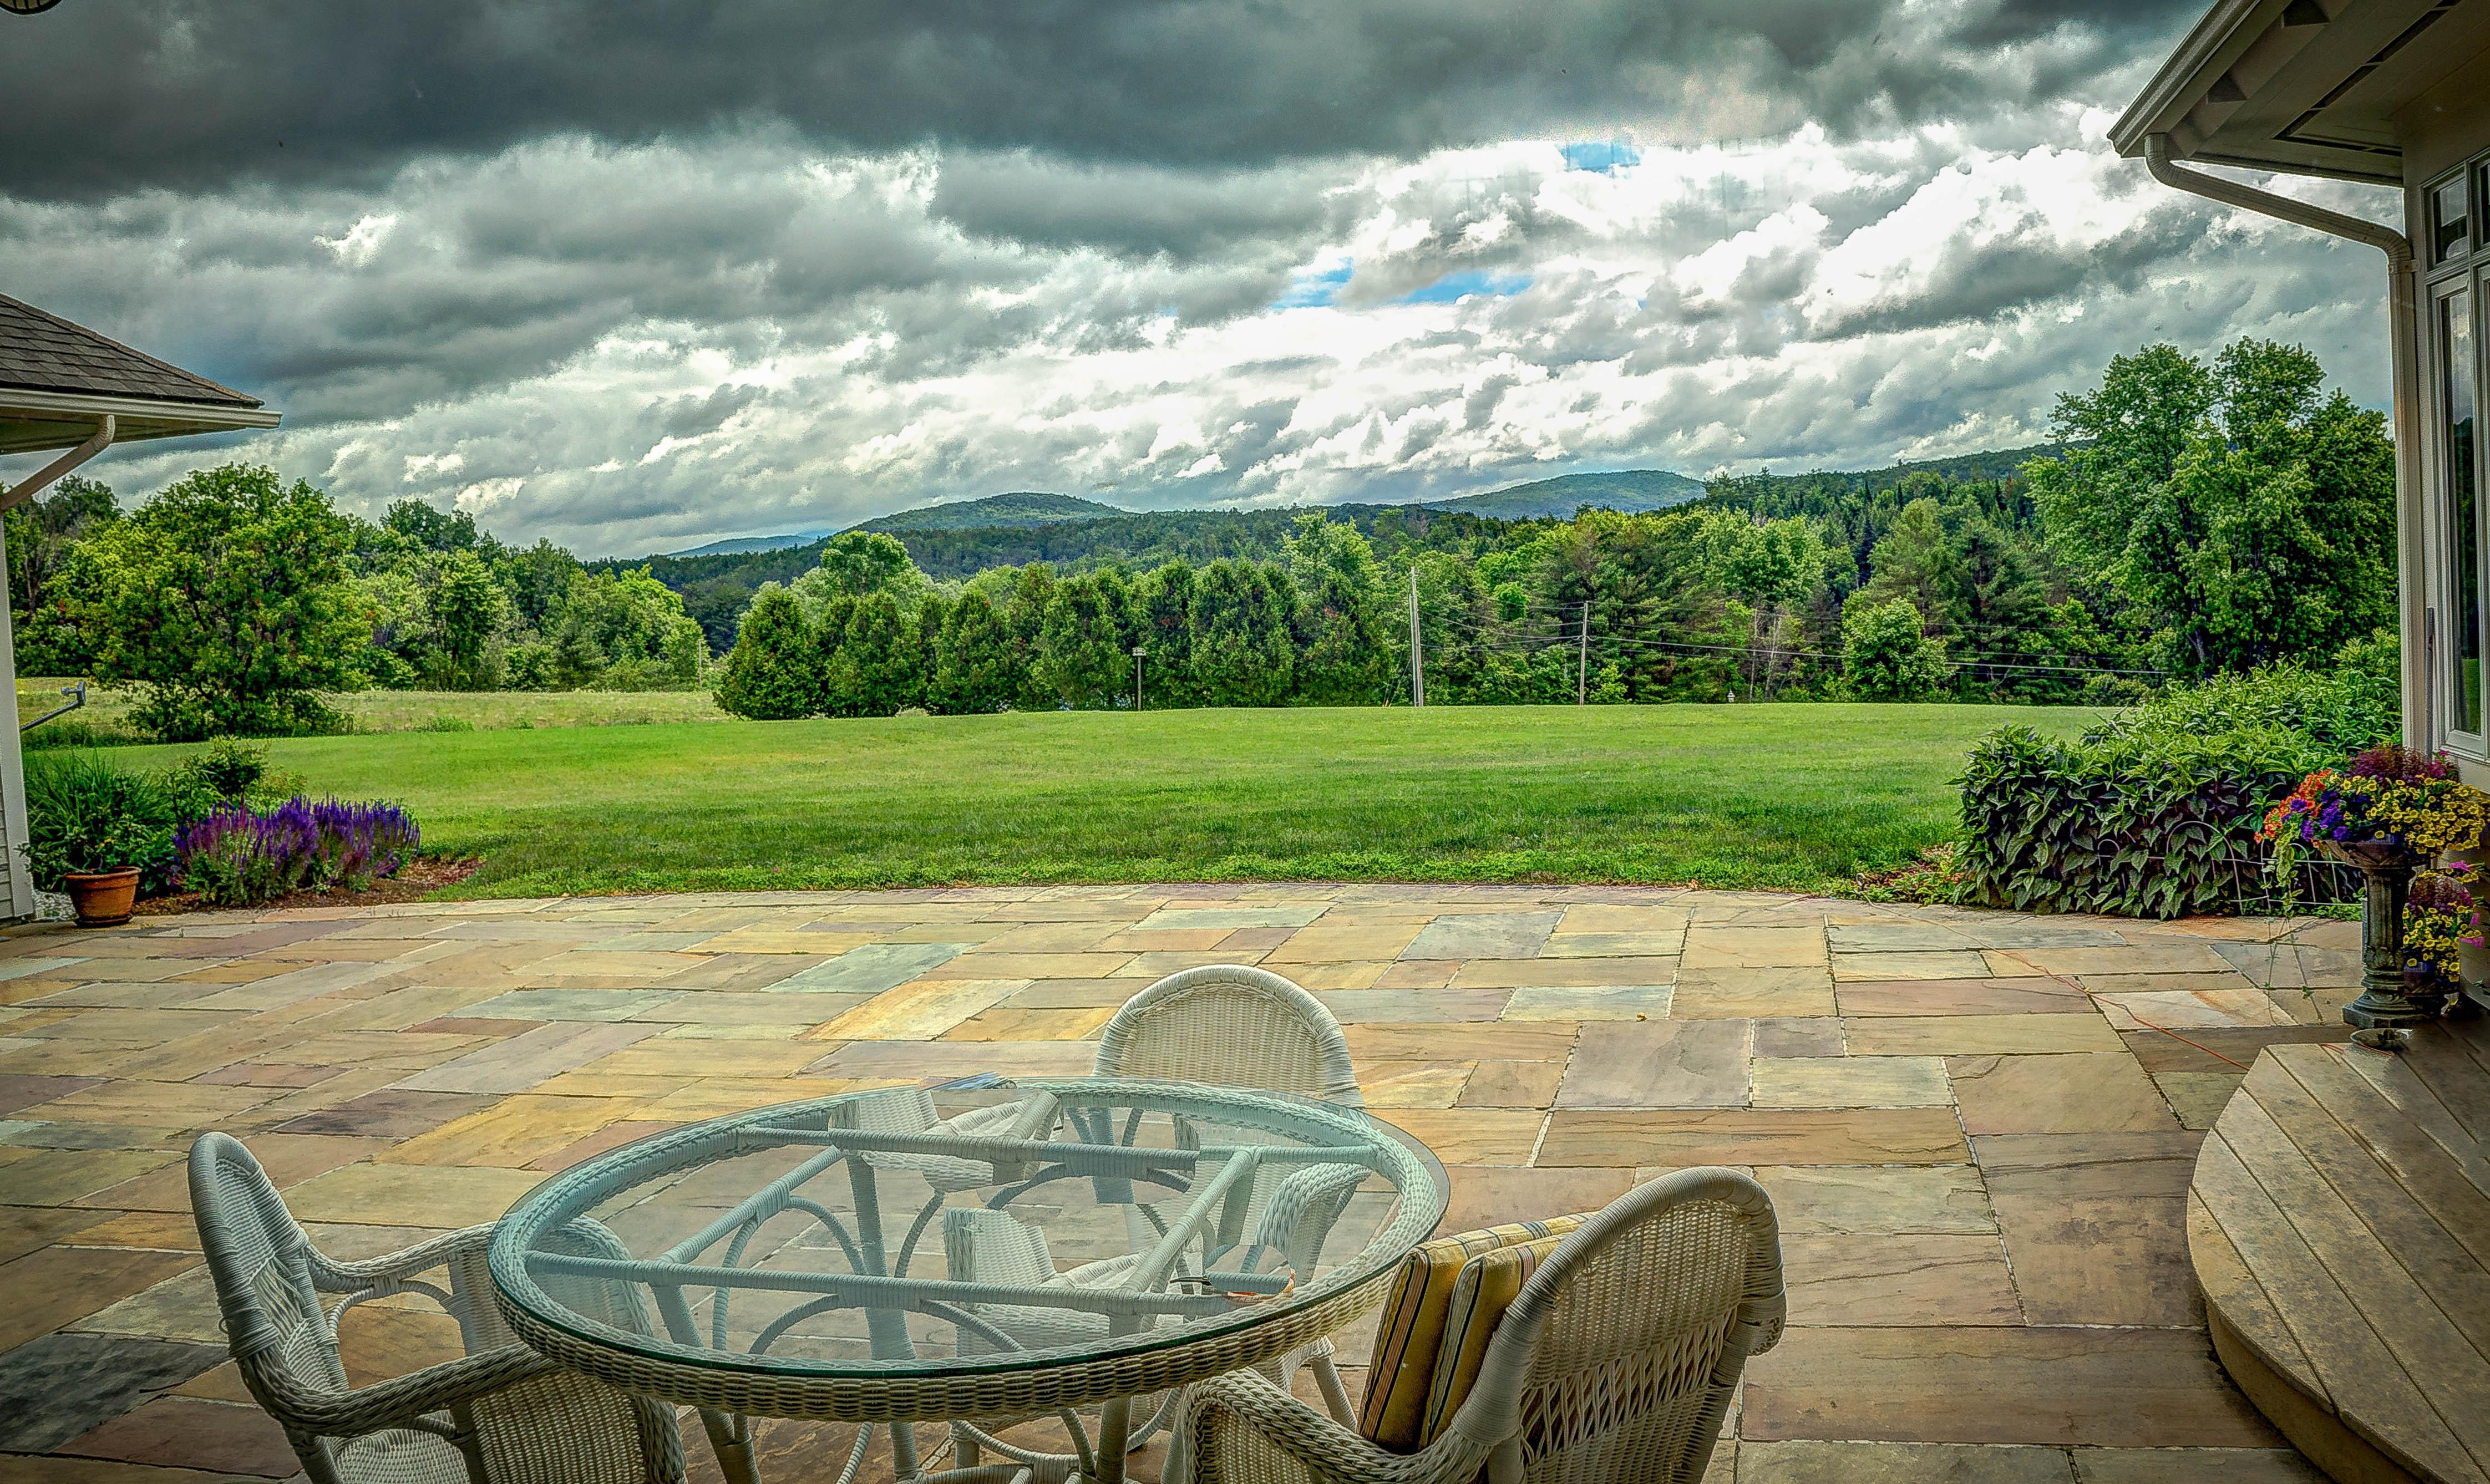 landschaft berg panorama ferien grn hinterhof garten berge immobilien vermont lndliches gebiet mansfield mount mansfield unterhaufen - Hinterhof Landschaften Bilder